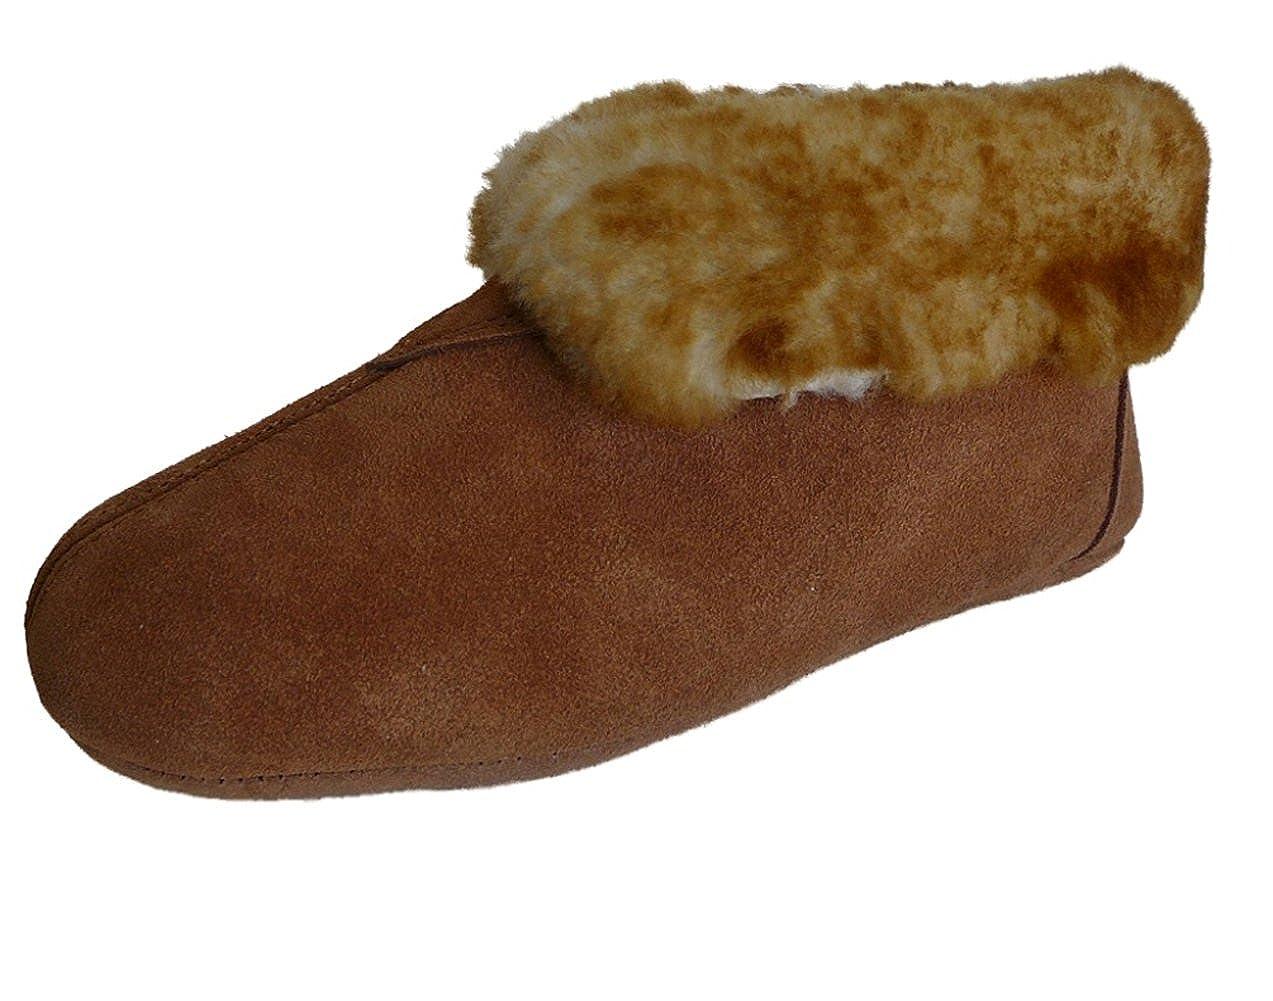 25c551501ae WoolWorks Model 9-75 Men's Australian Sheepskin Slippers - Soft Leather Sole